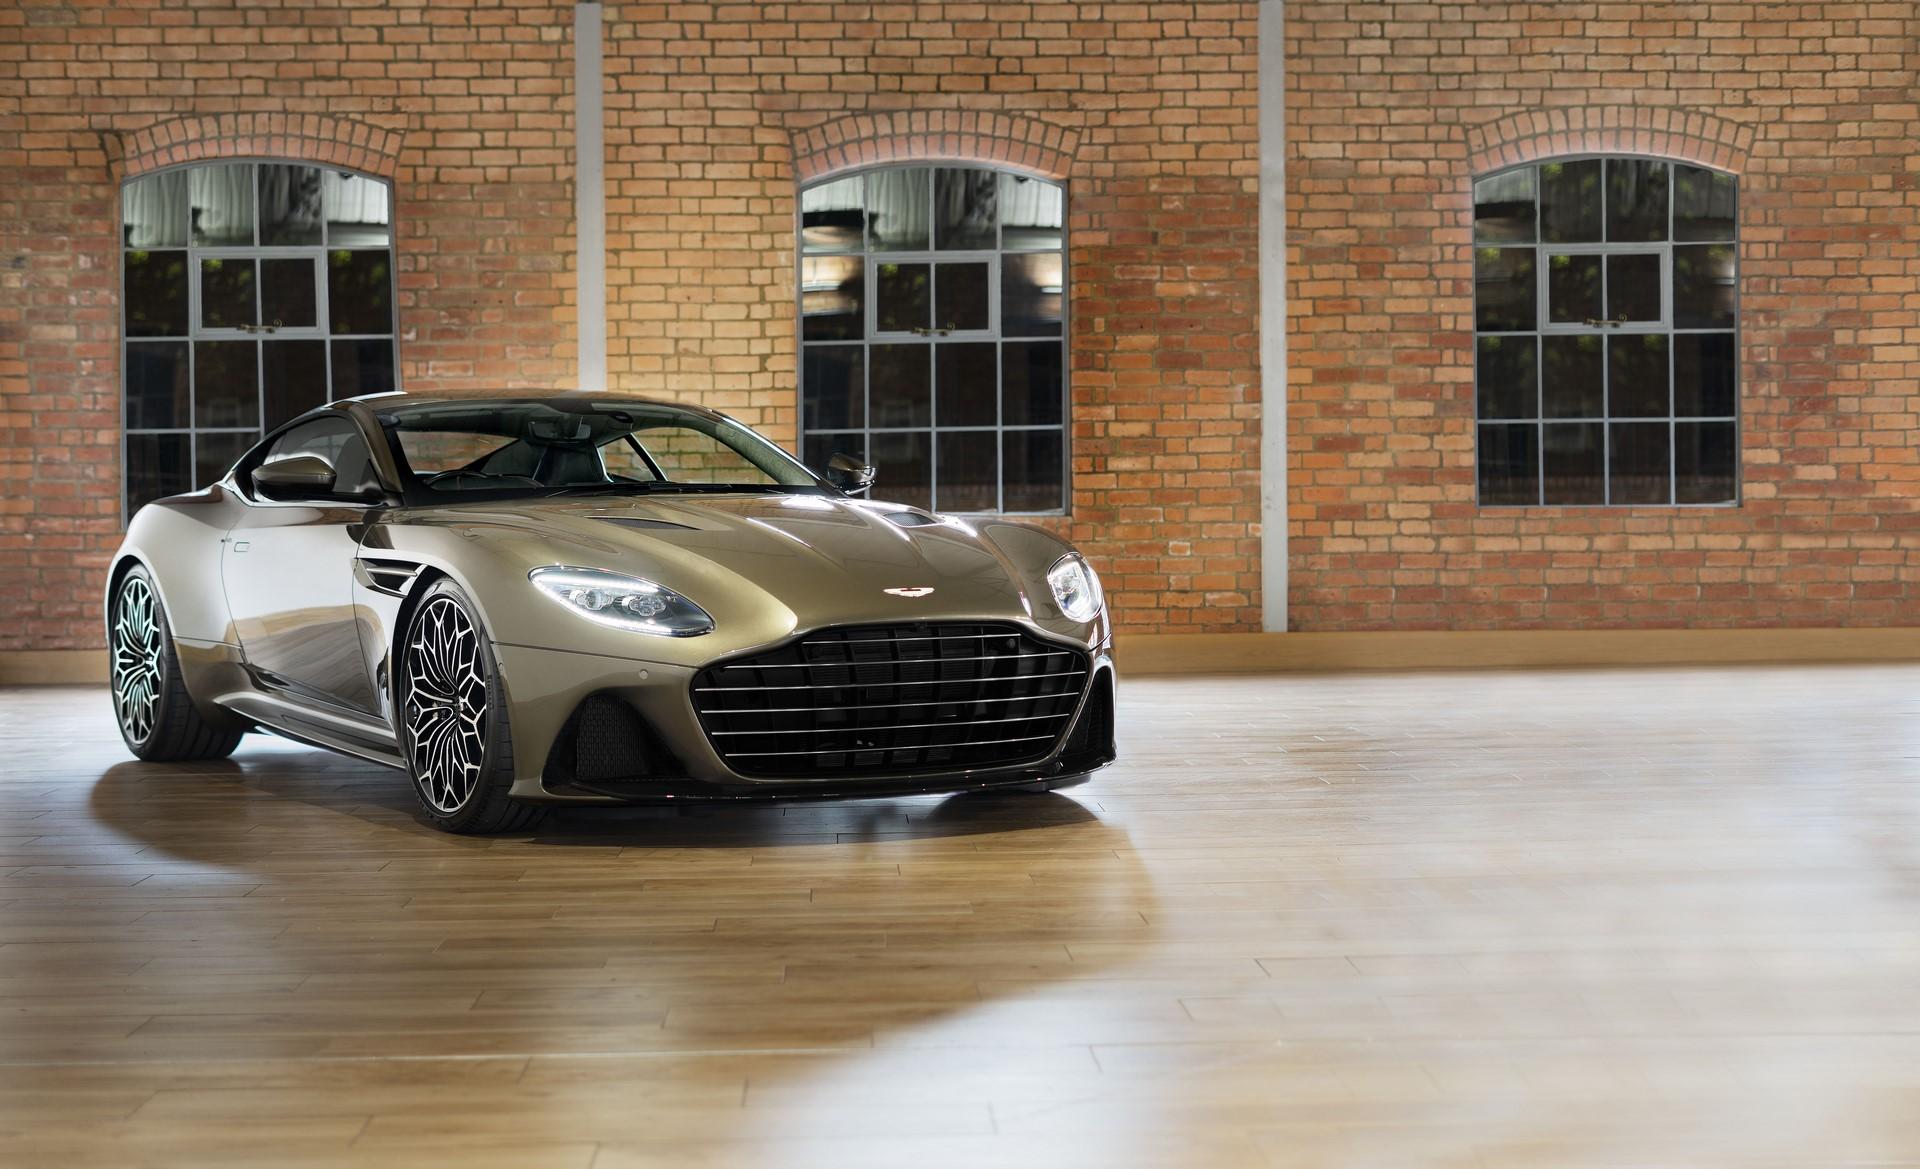 Aston-Martin-DBS-Superleggera-James-Bond-Special-Edition-4